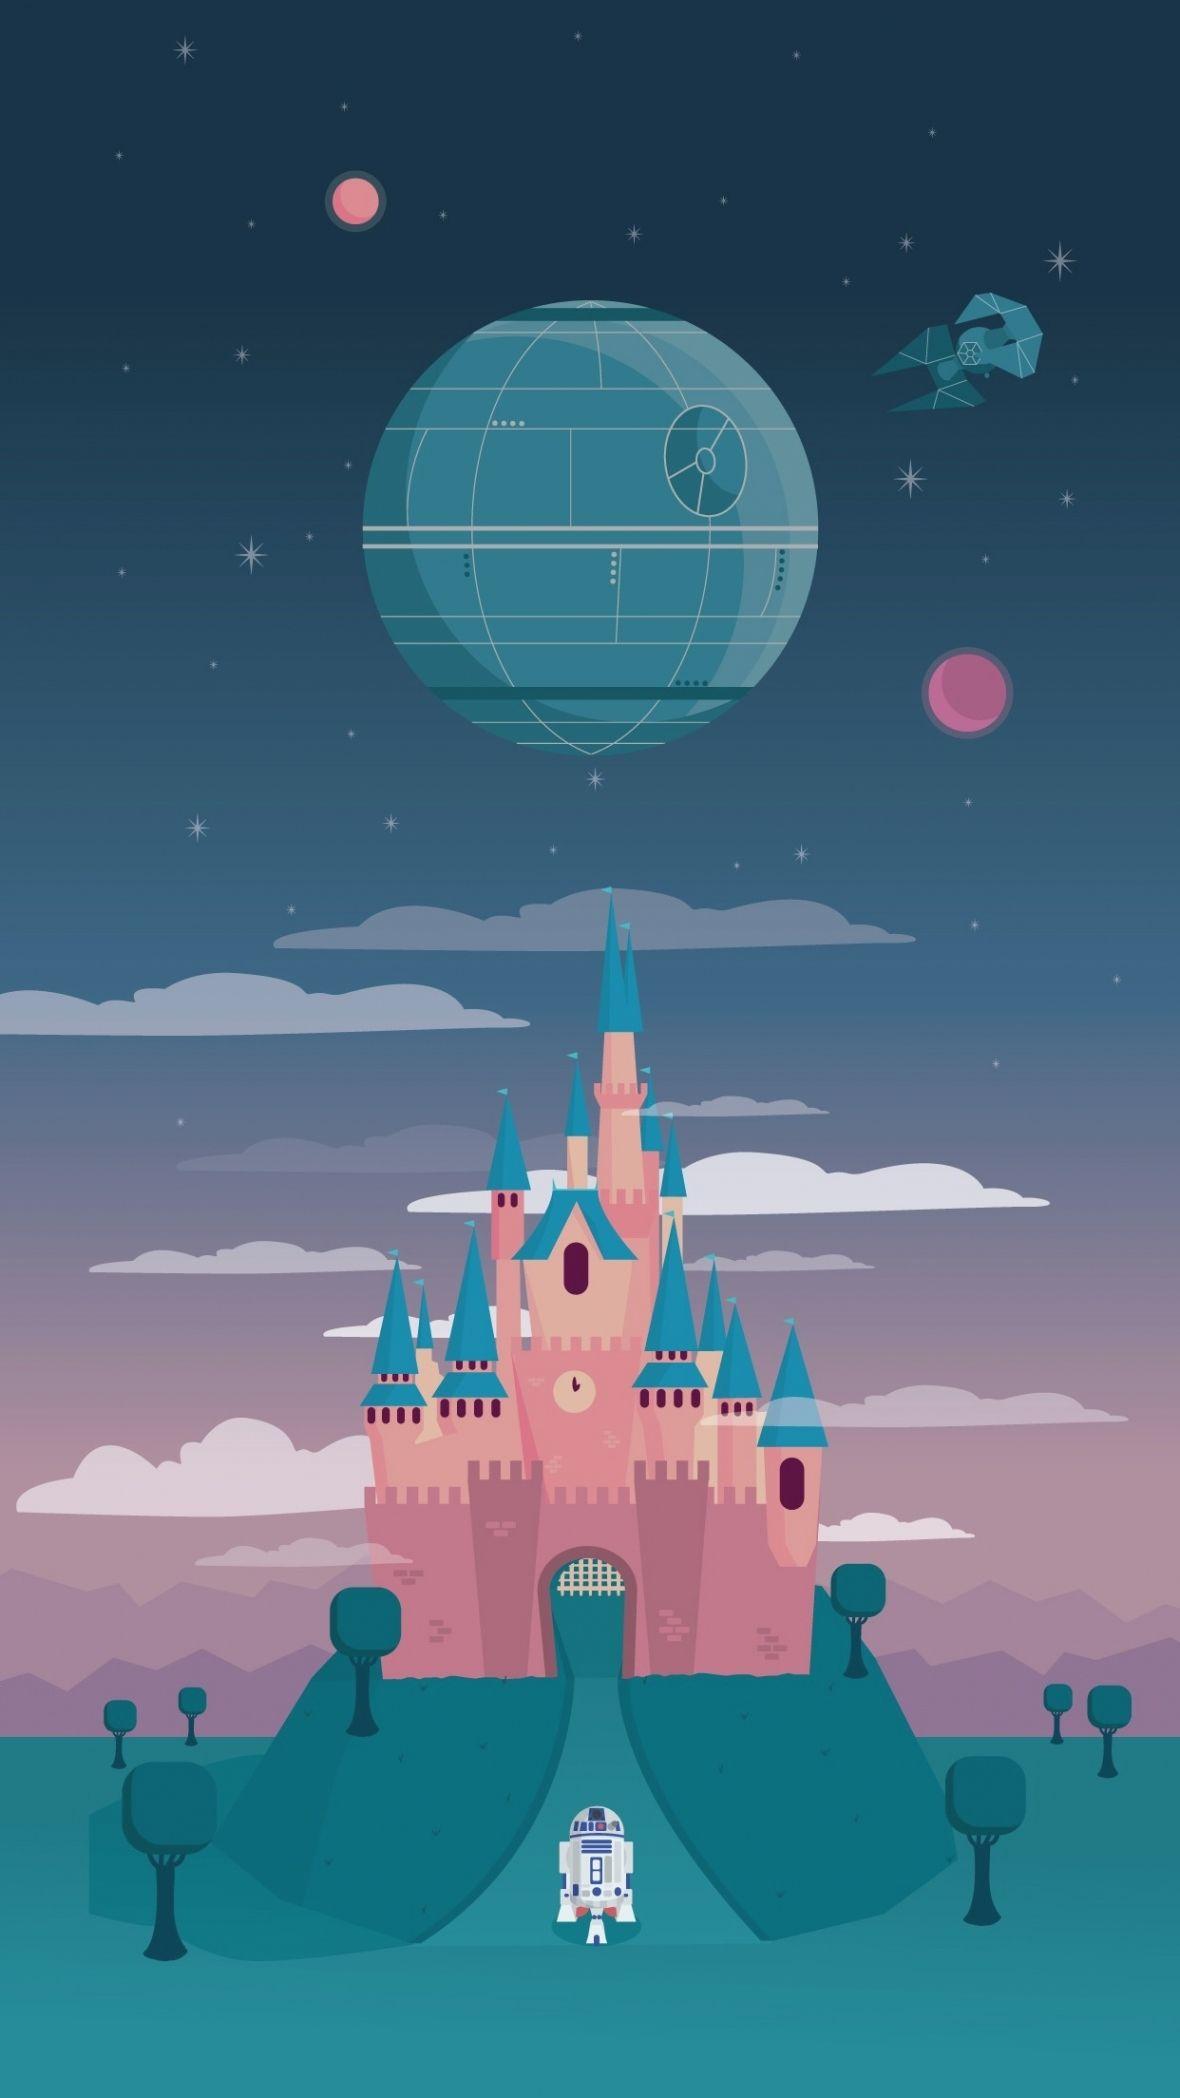 Wallpaper Tumblr Disney posted by Sarah Johnson